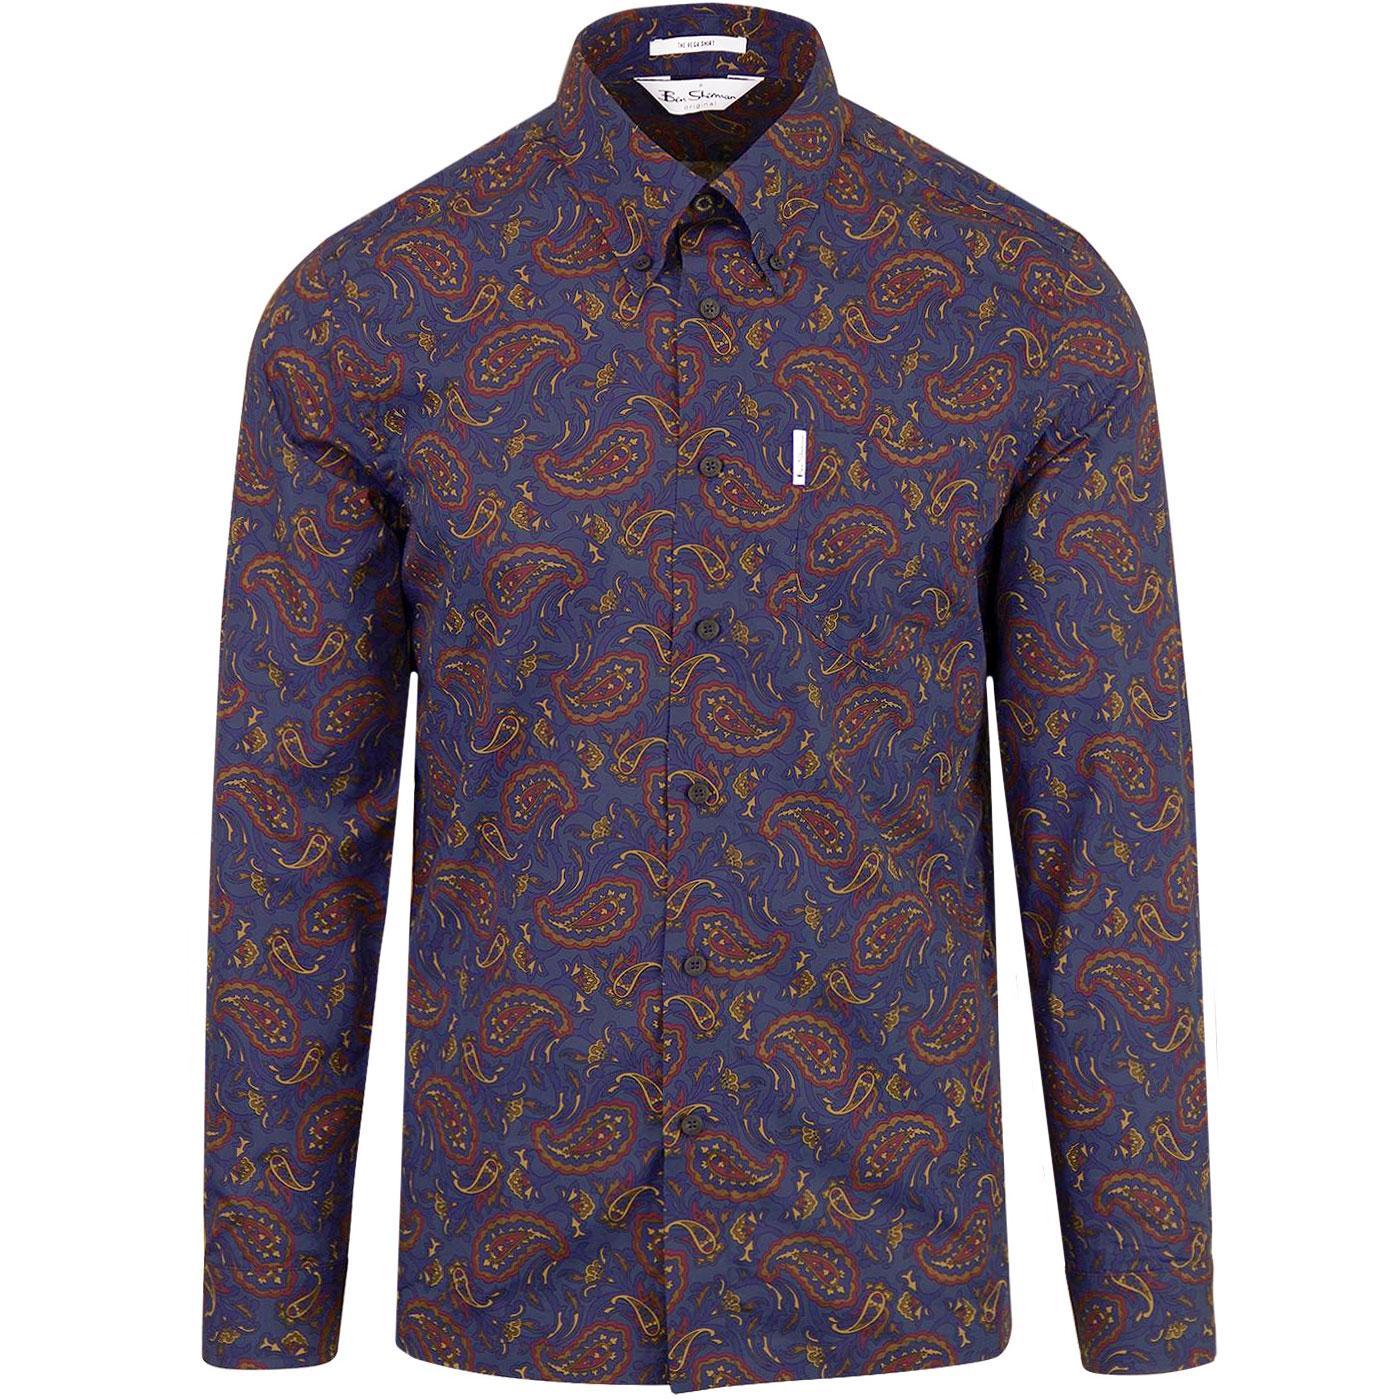 Vega BEN SHERMAN 1980s Mod Paisley Archive Shirt